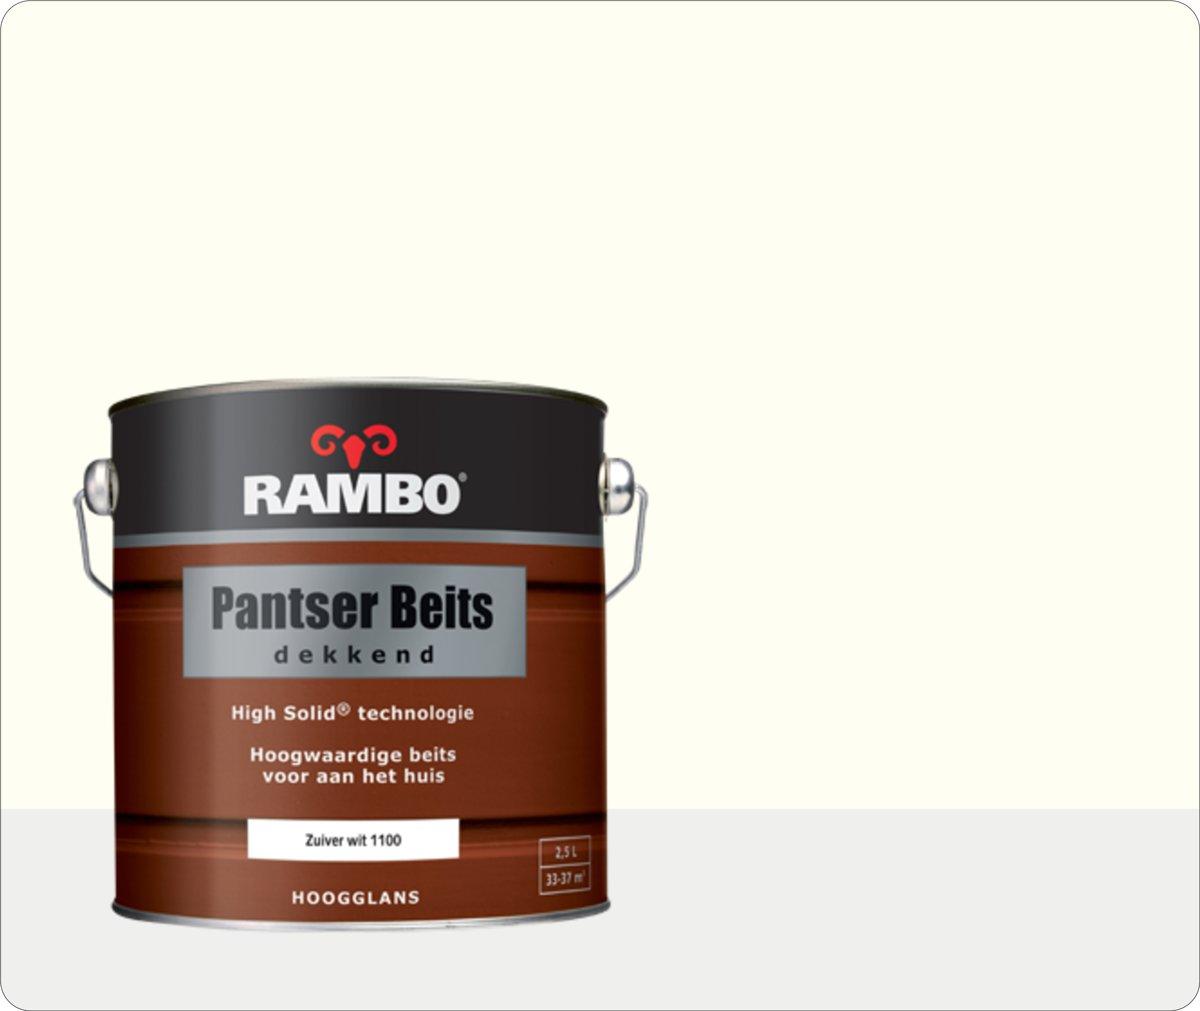 Rambo Pantser Beits Dekkend - 2,5 liter - Zuiverwit